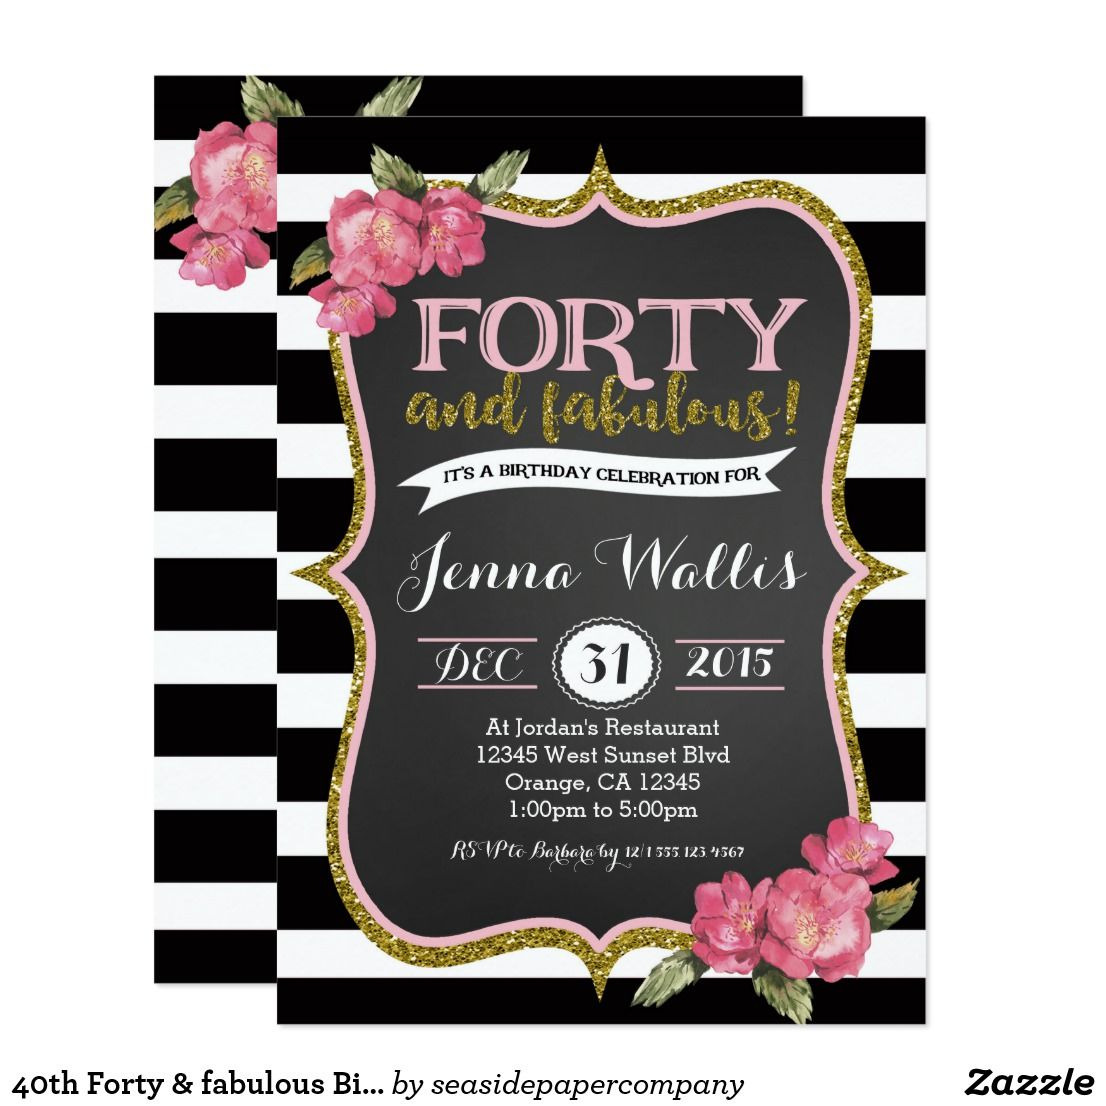 40th Forty & fabulous Birthday Invitation | Birthdays and 40 birthday